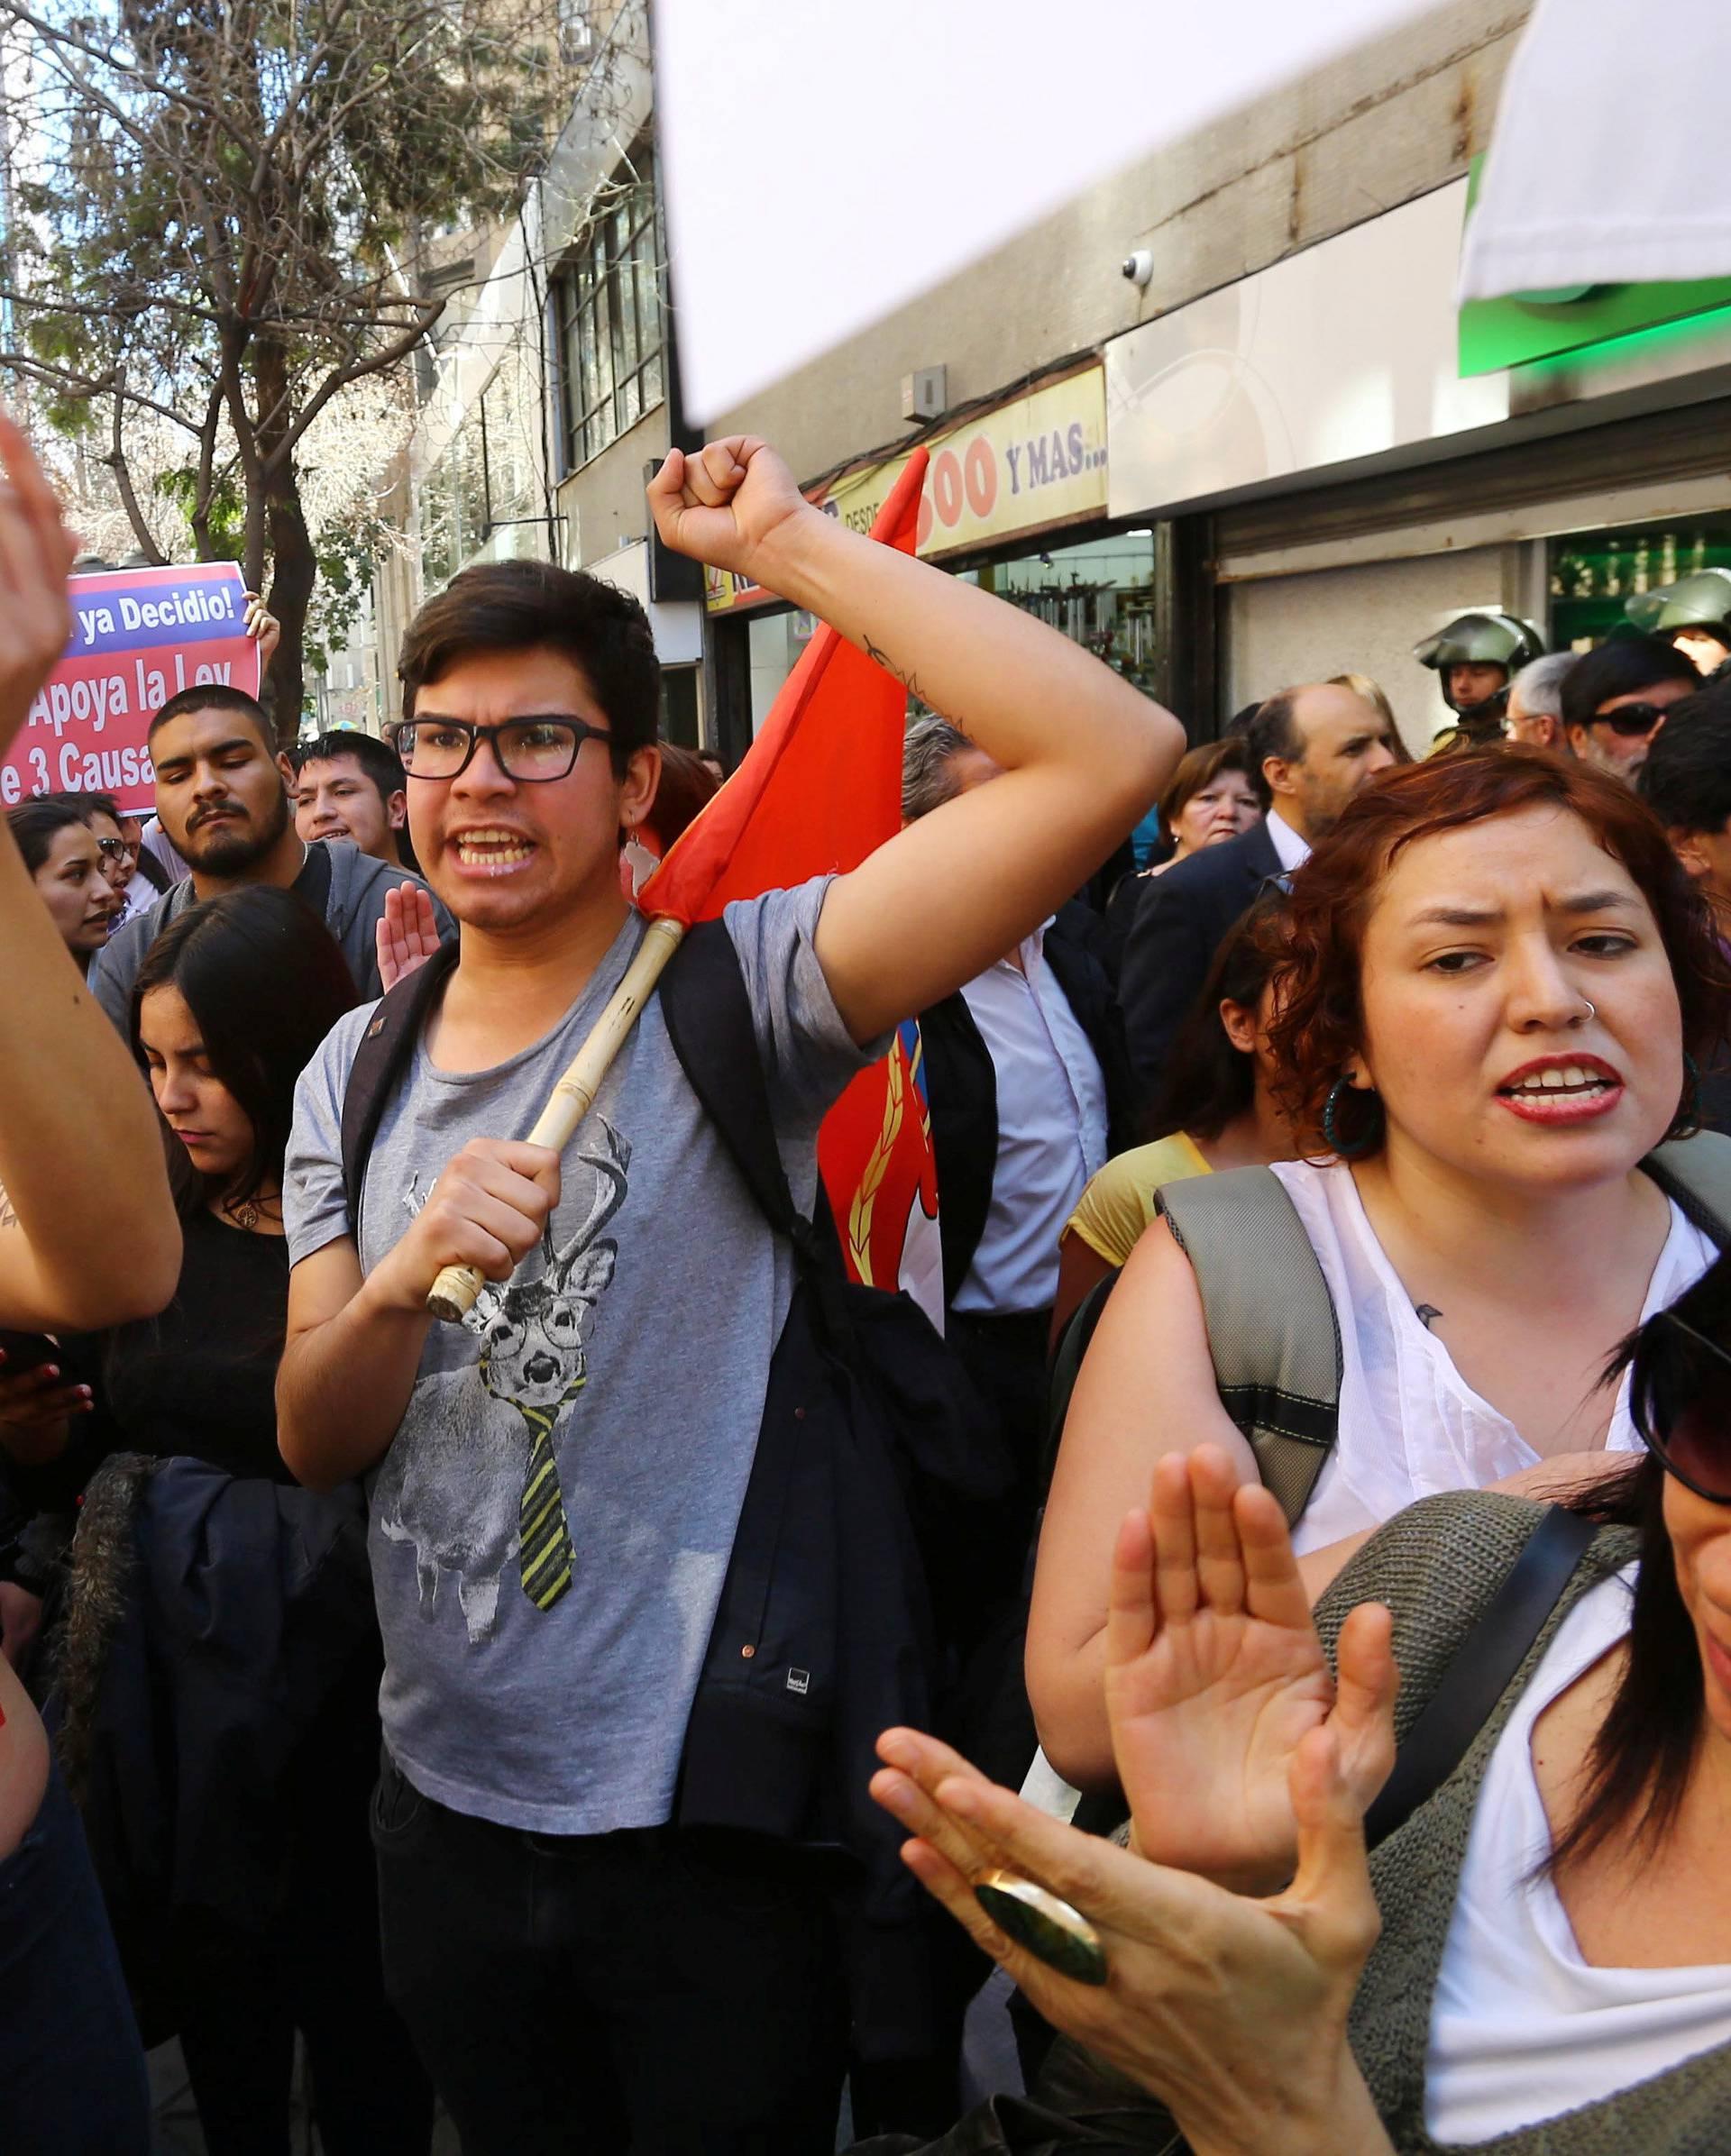 Demonstrators in favour of abortion celebrate in Santiago